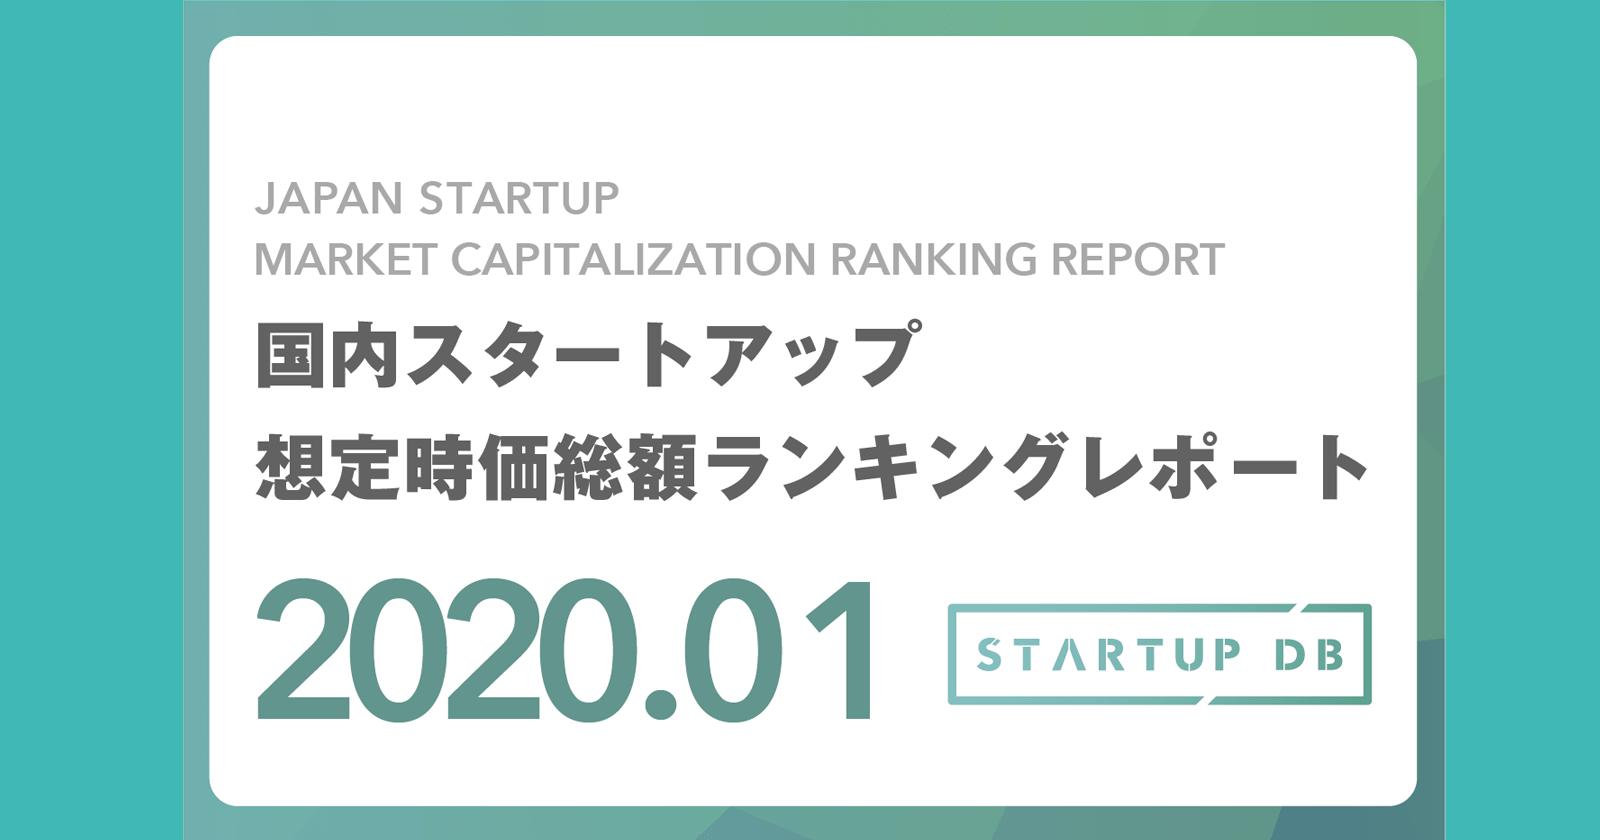 【STARTUP DB】調査結果 国内スタートアップ想定時価総額ランキング(2020年2月) 人工合成クモ糸のSpiber、国内7社目のユニコーン企業へ